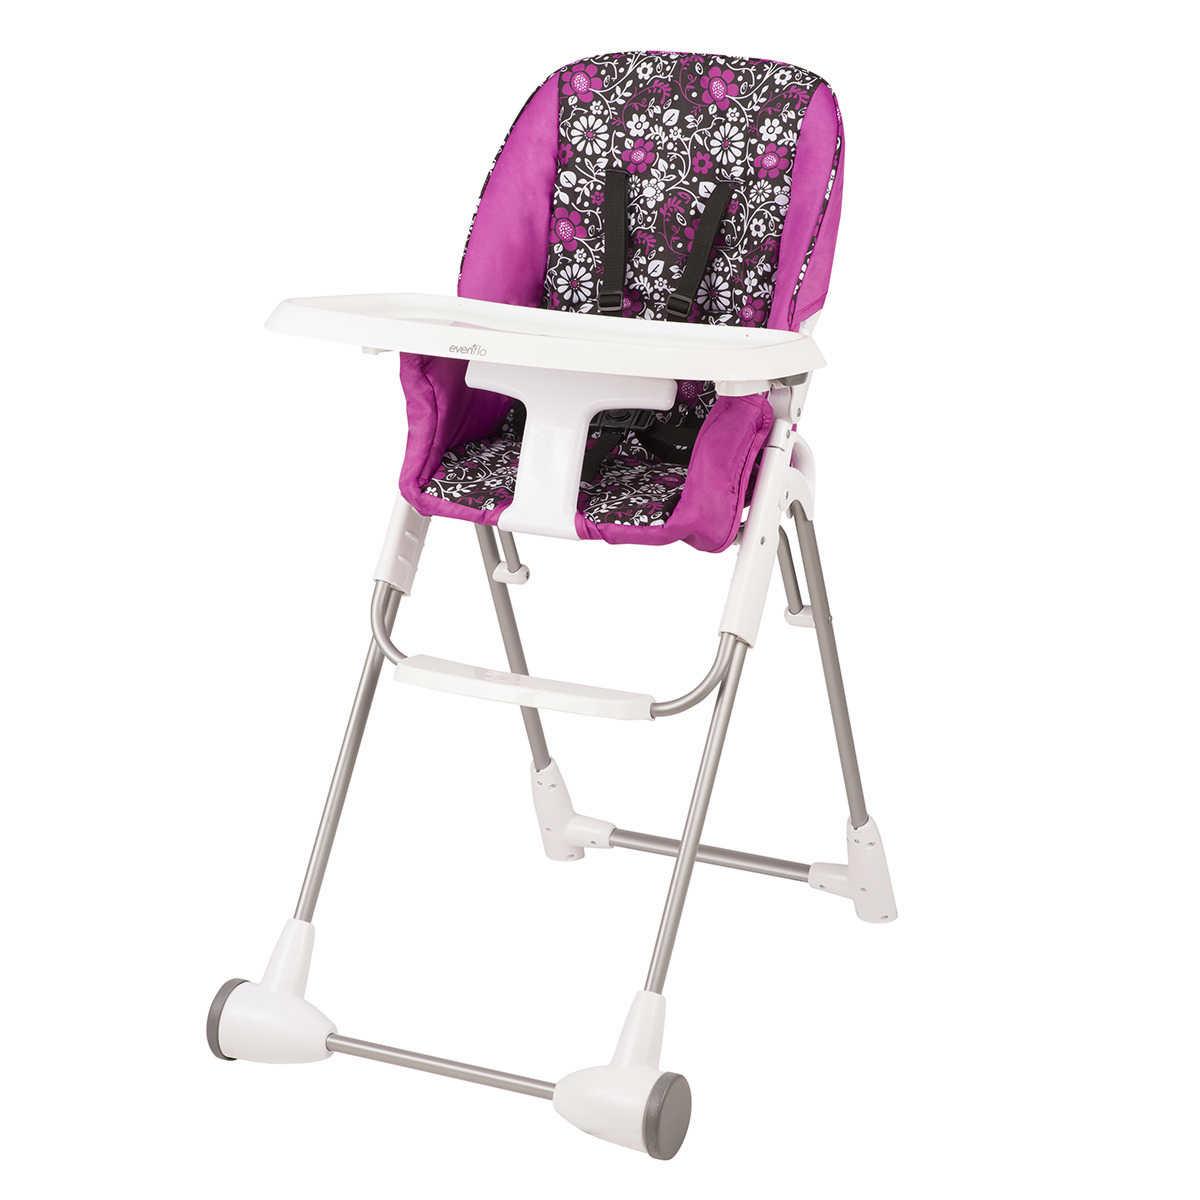 Cosco flat fold high chair - Evenflo Symmetry High Chair Daphne